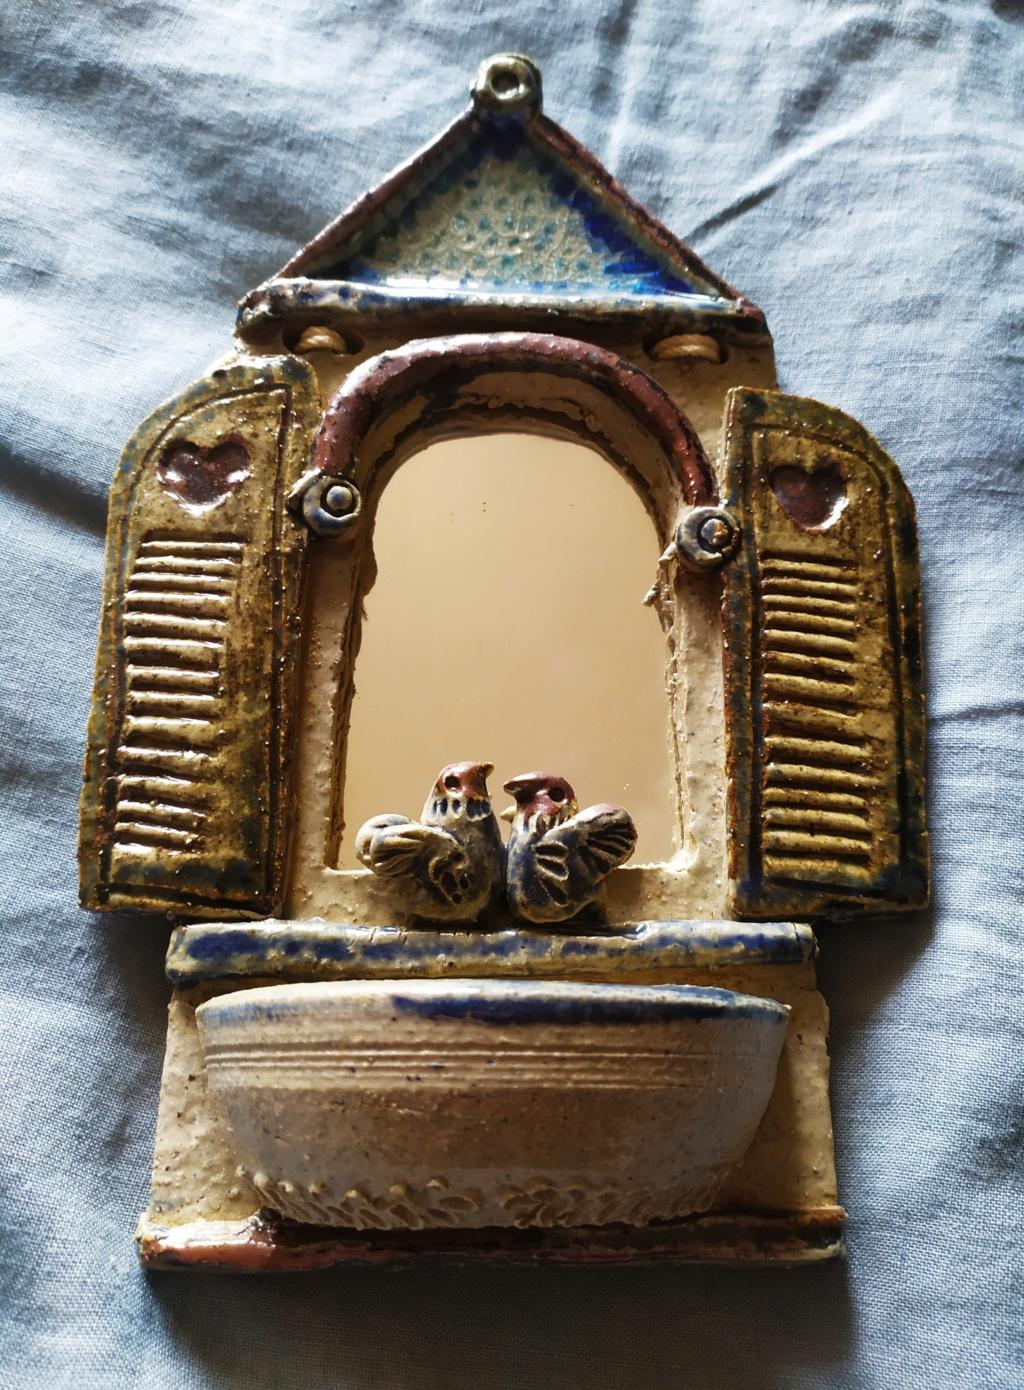 Miroir oh mon beau miroir ! Catido Dominique Dupo Img_2014